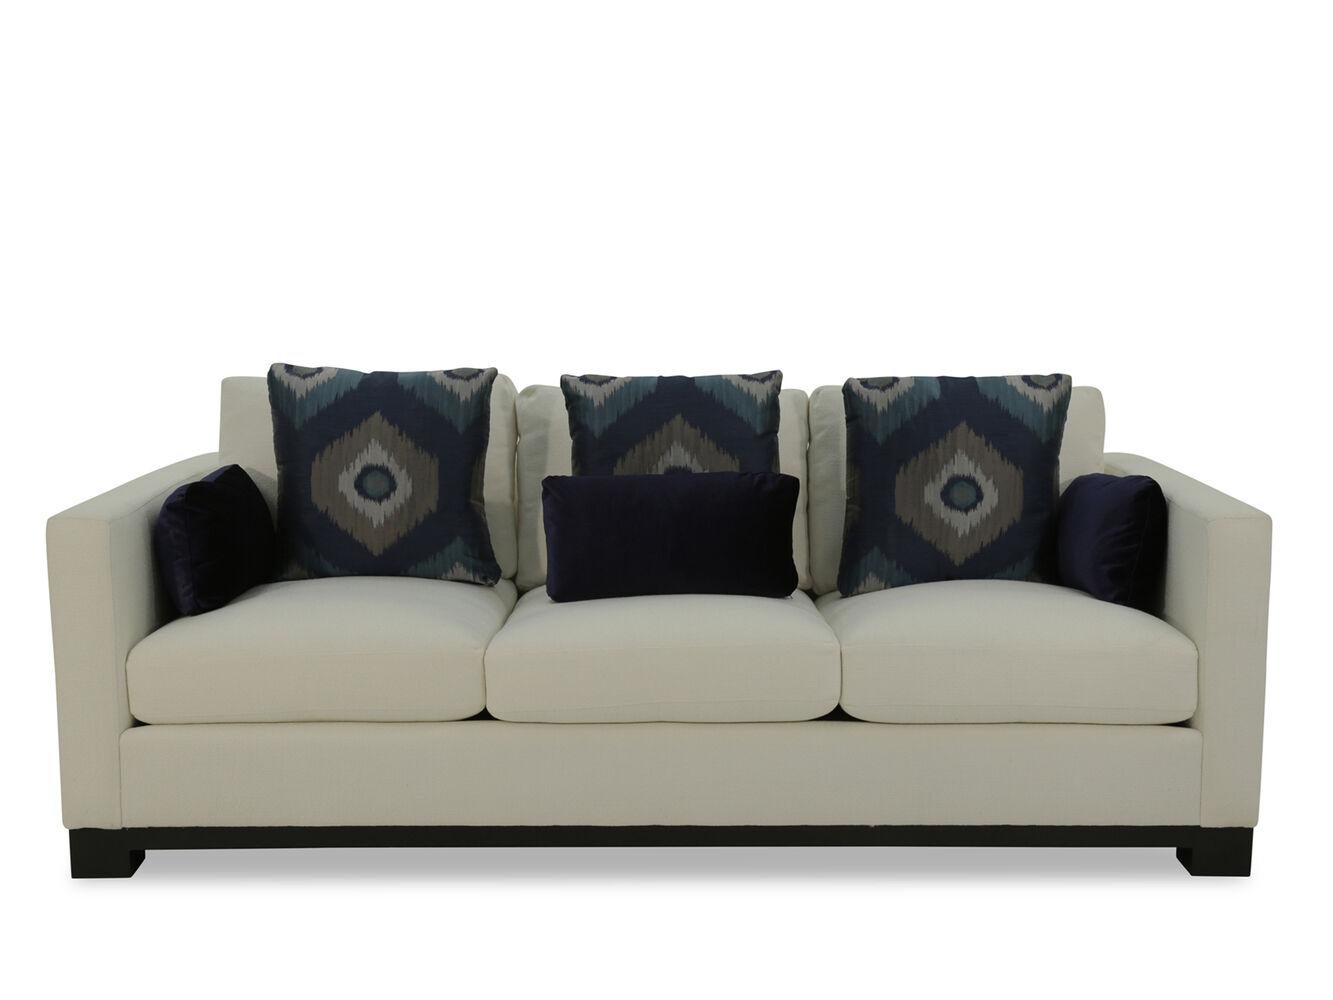 Bernhardt Lanai Fabric Cream Sofa Mathis Brothers Furniture : BHT N165601 from www.mathisbrothers.com size 1333 x 1000 jpeg 60kB